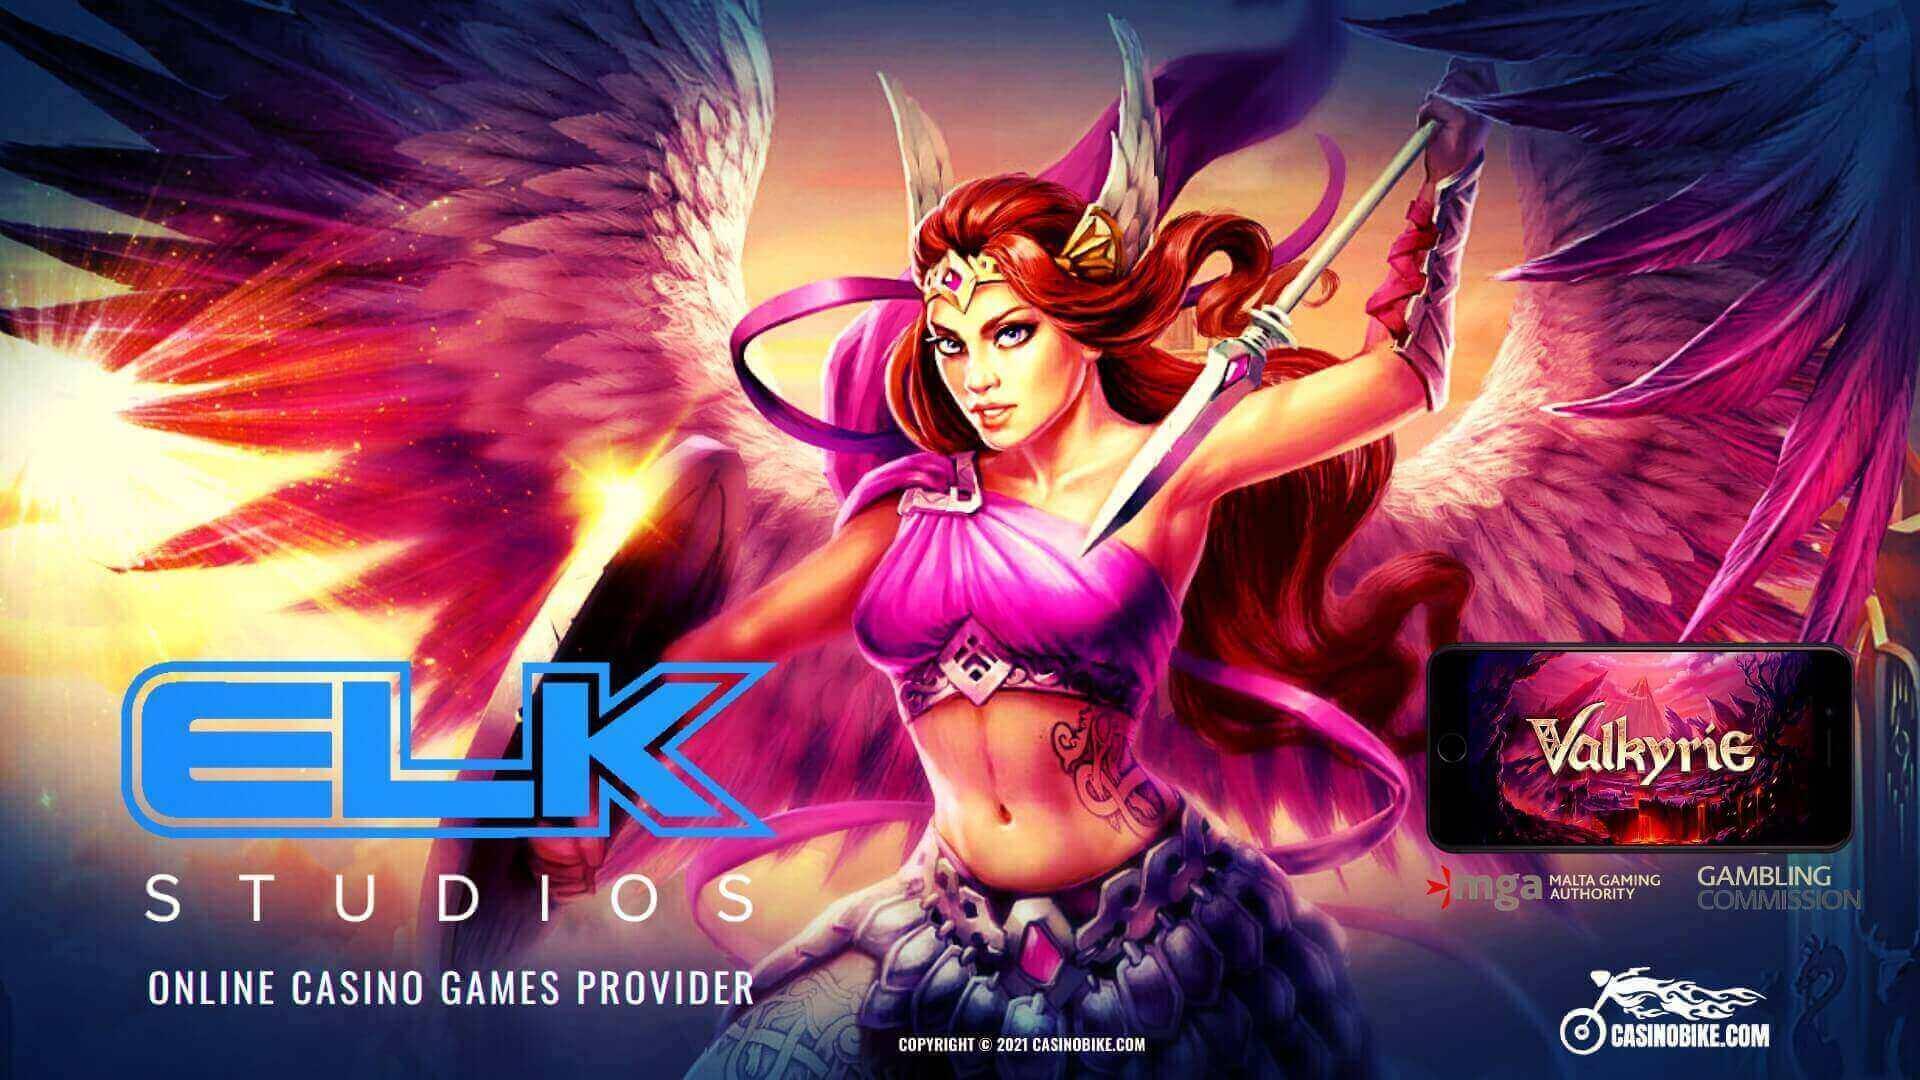 Elk Studios Casino Games Provider Review